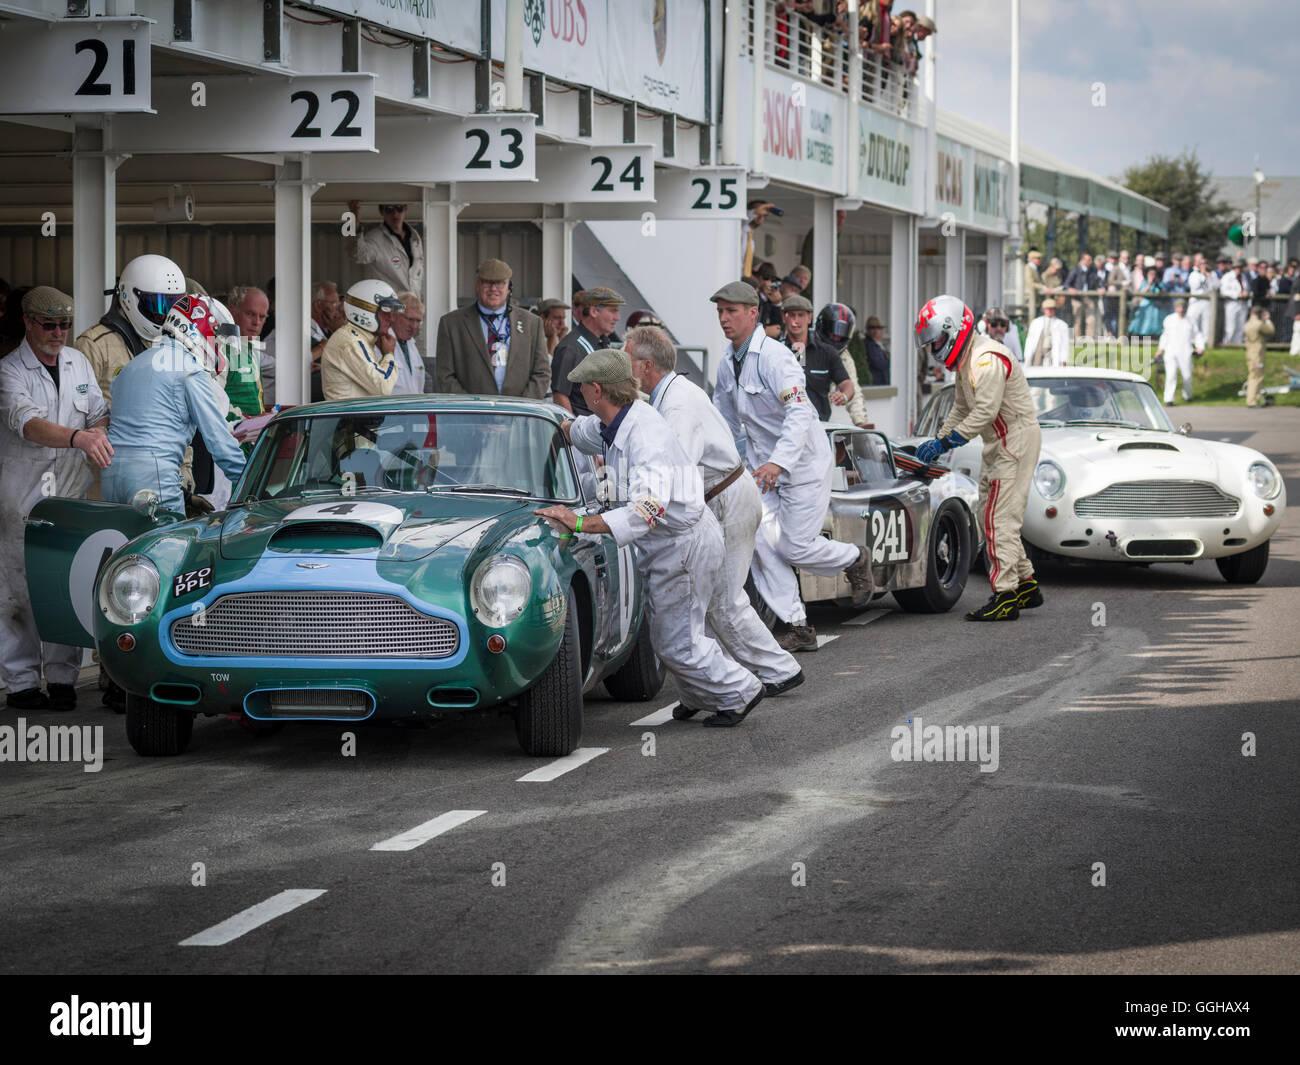 1960 Aston Martin DB4 GT, driver change at the pit lane, RAC TT Celebration, Goodwood Revival 2014, Racing Sport, - Stock Image